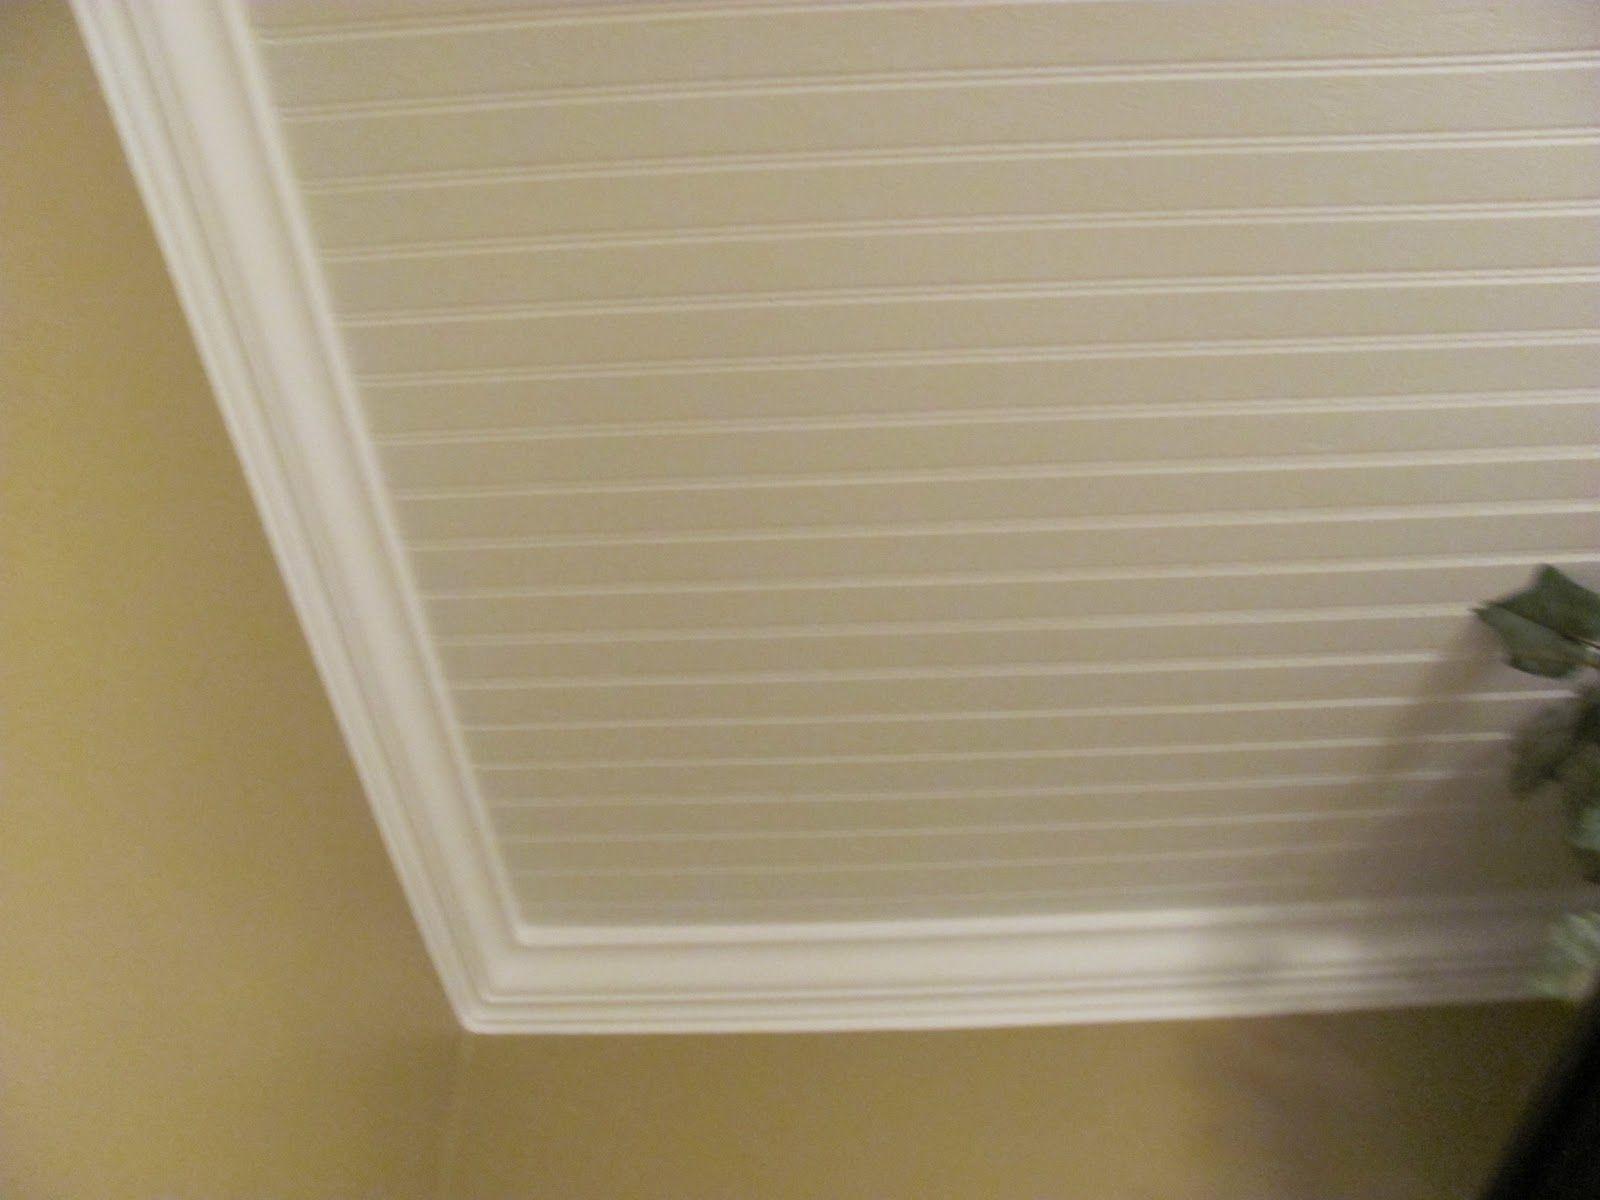 beadboard ceiling ideas - Google Search | Home Improvement ...